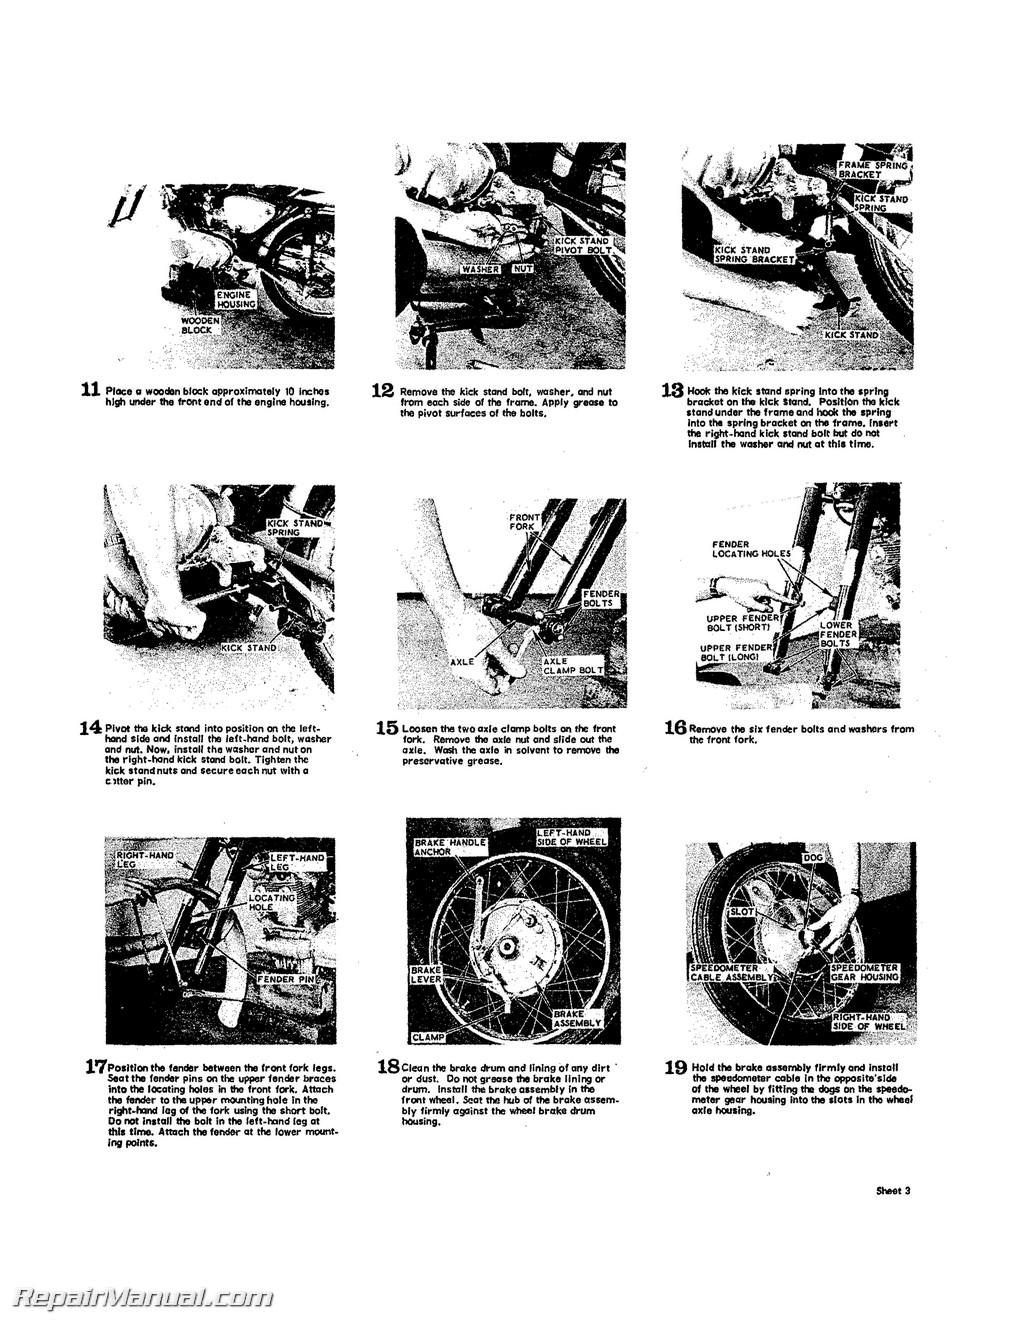 Honda Superhawk Amp Scrambler Motorcycle Restoration